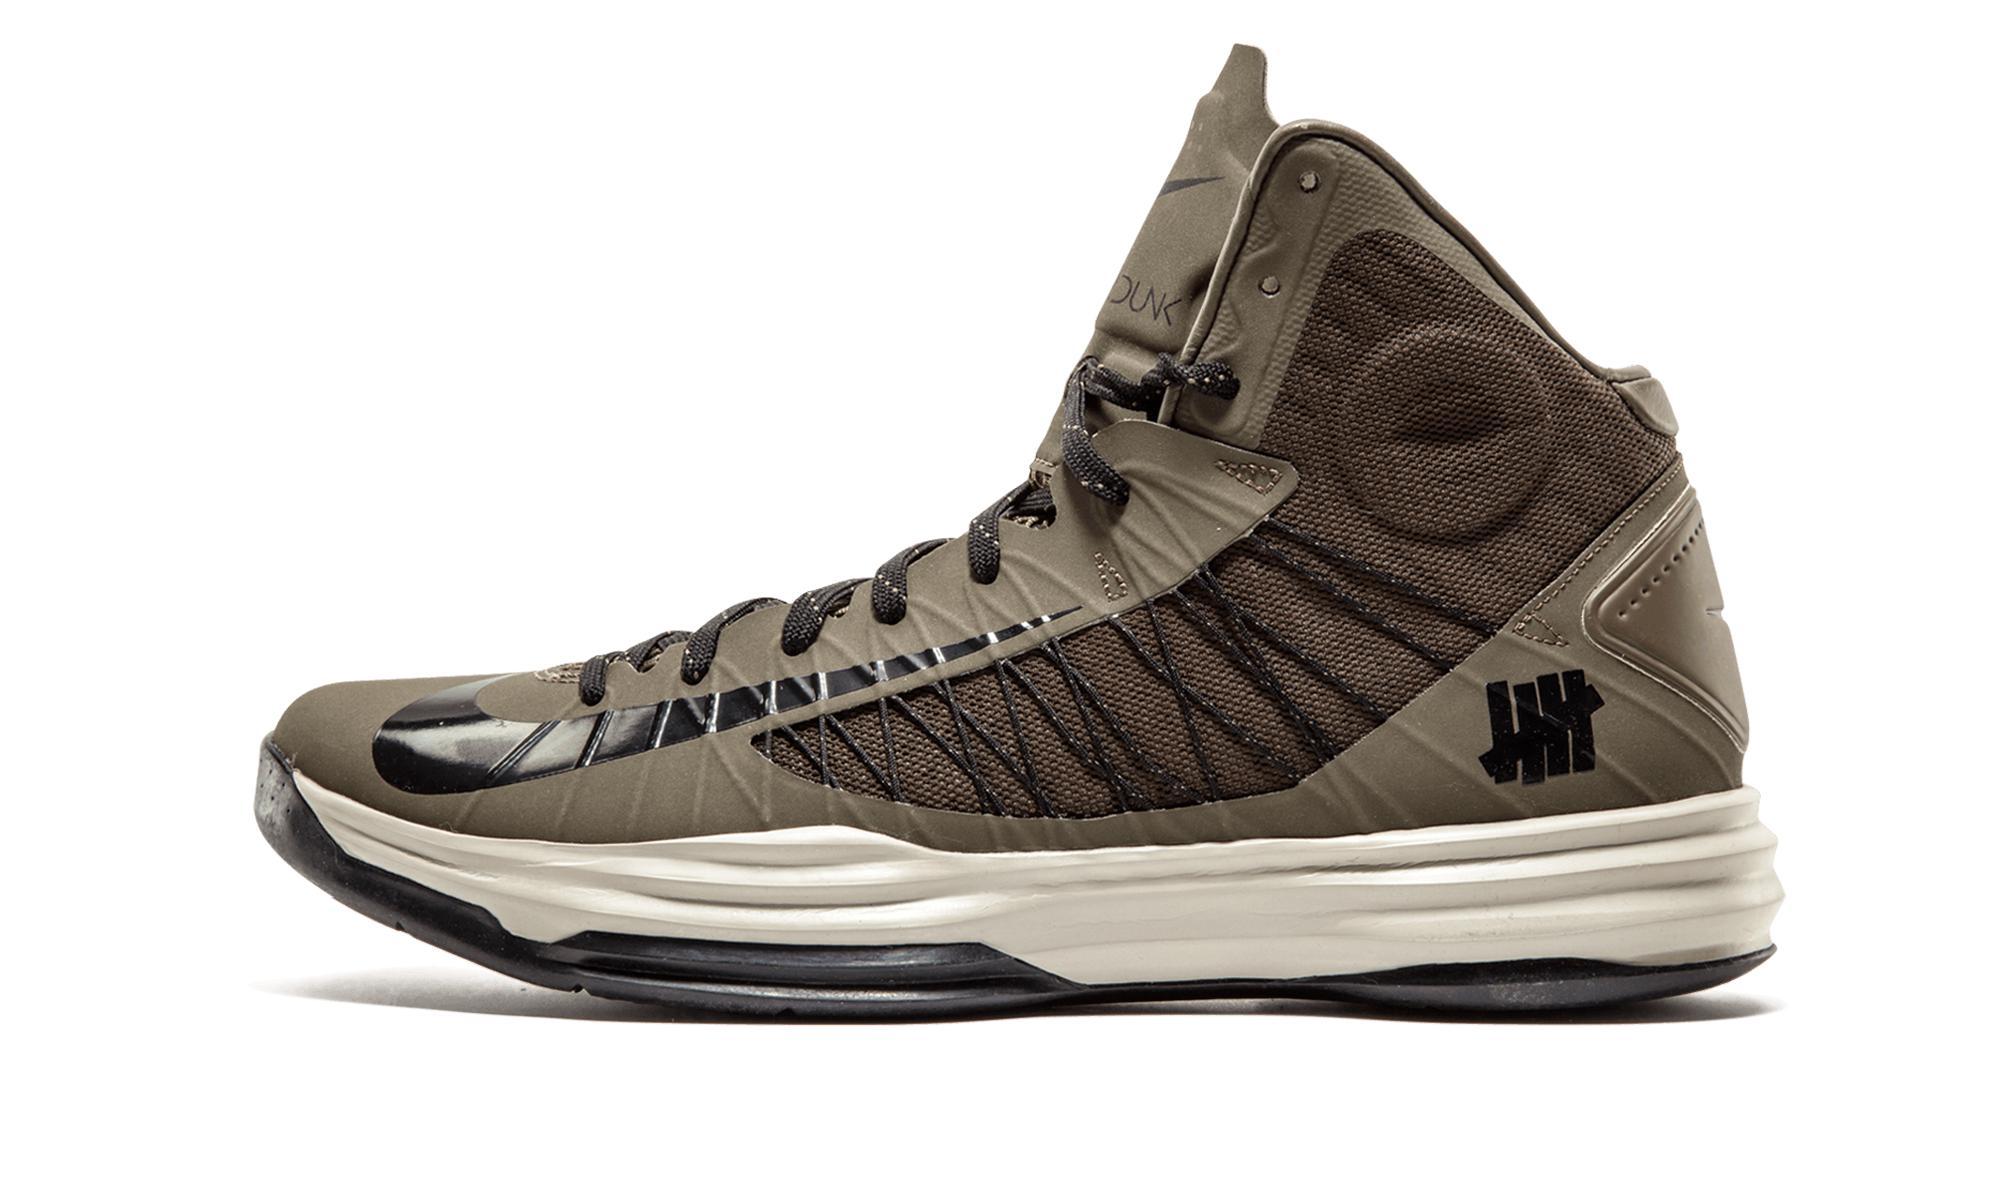 807f89f57315 Nike Hyperdunk Undftd Sp for Men - Lyst